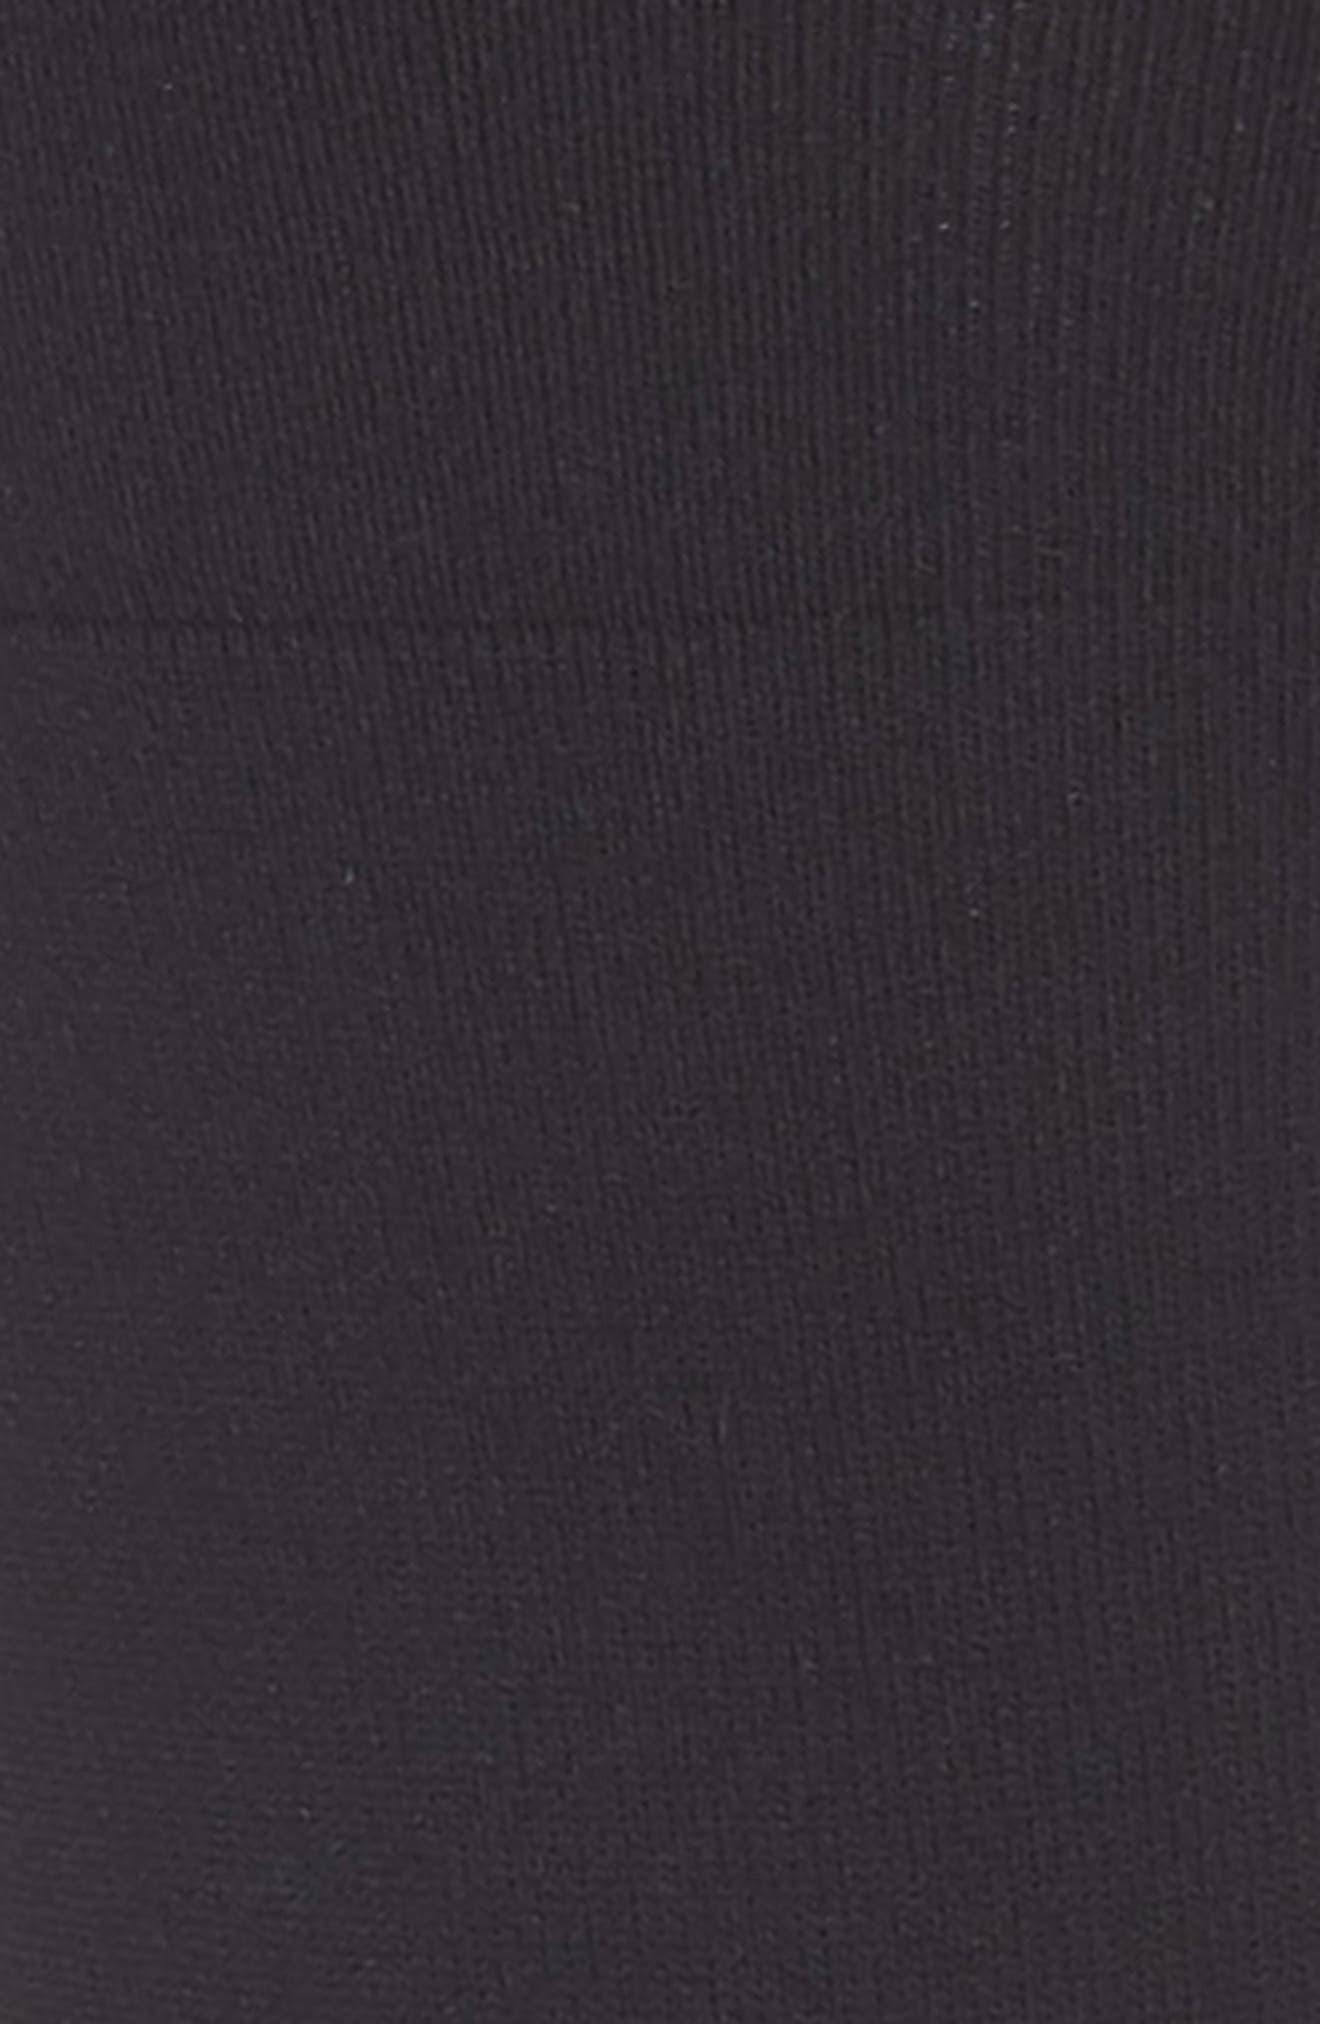 Ultra Sleek Crew Socks,                         Main,                         color, 001